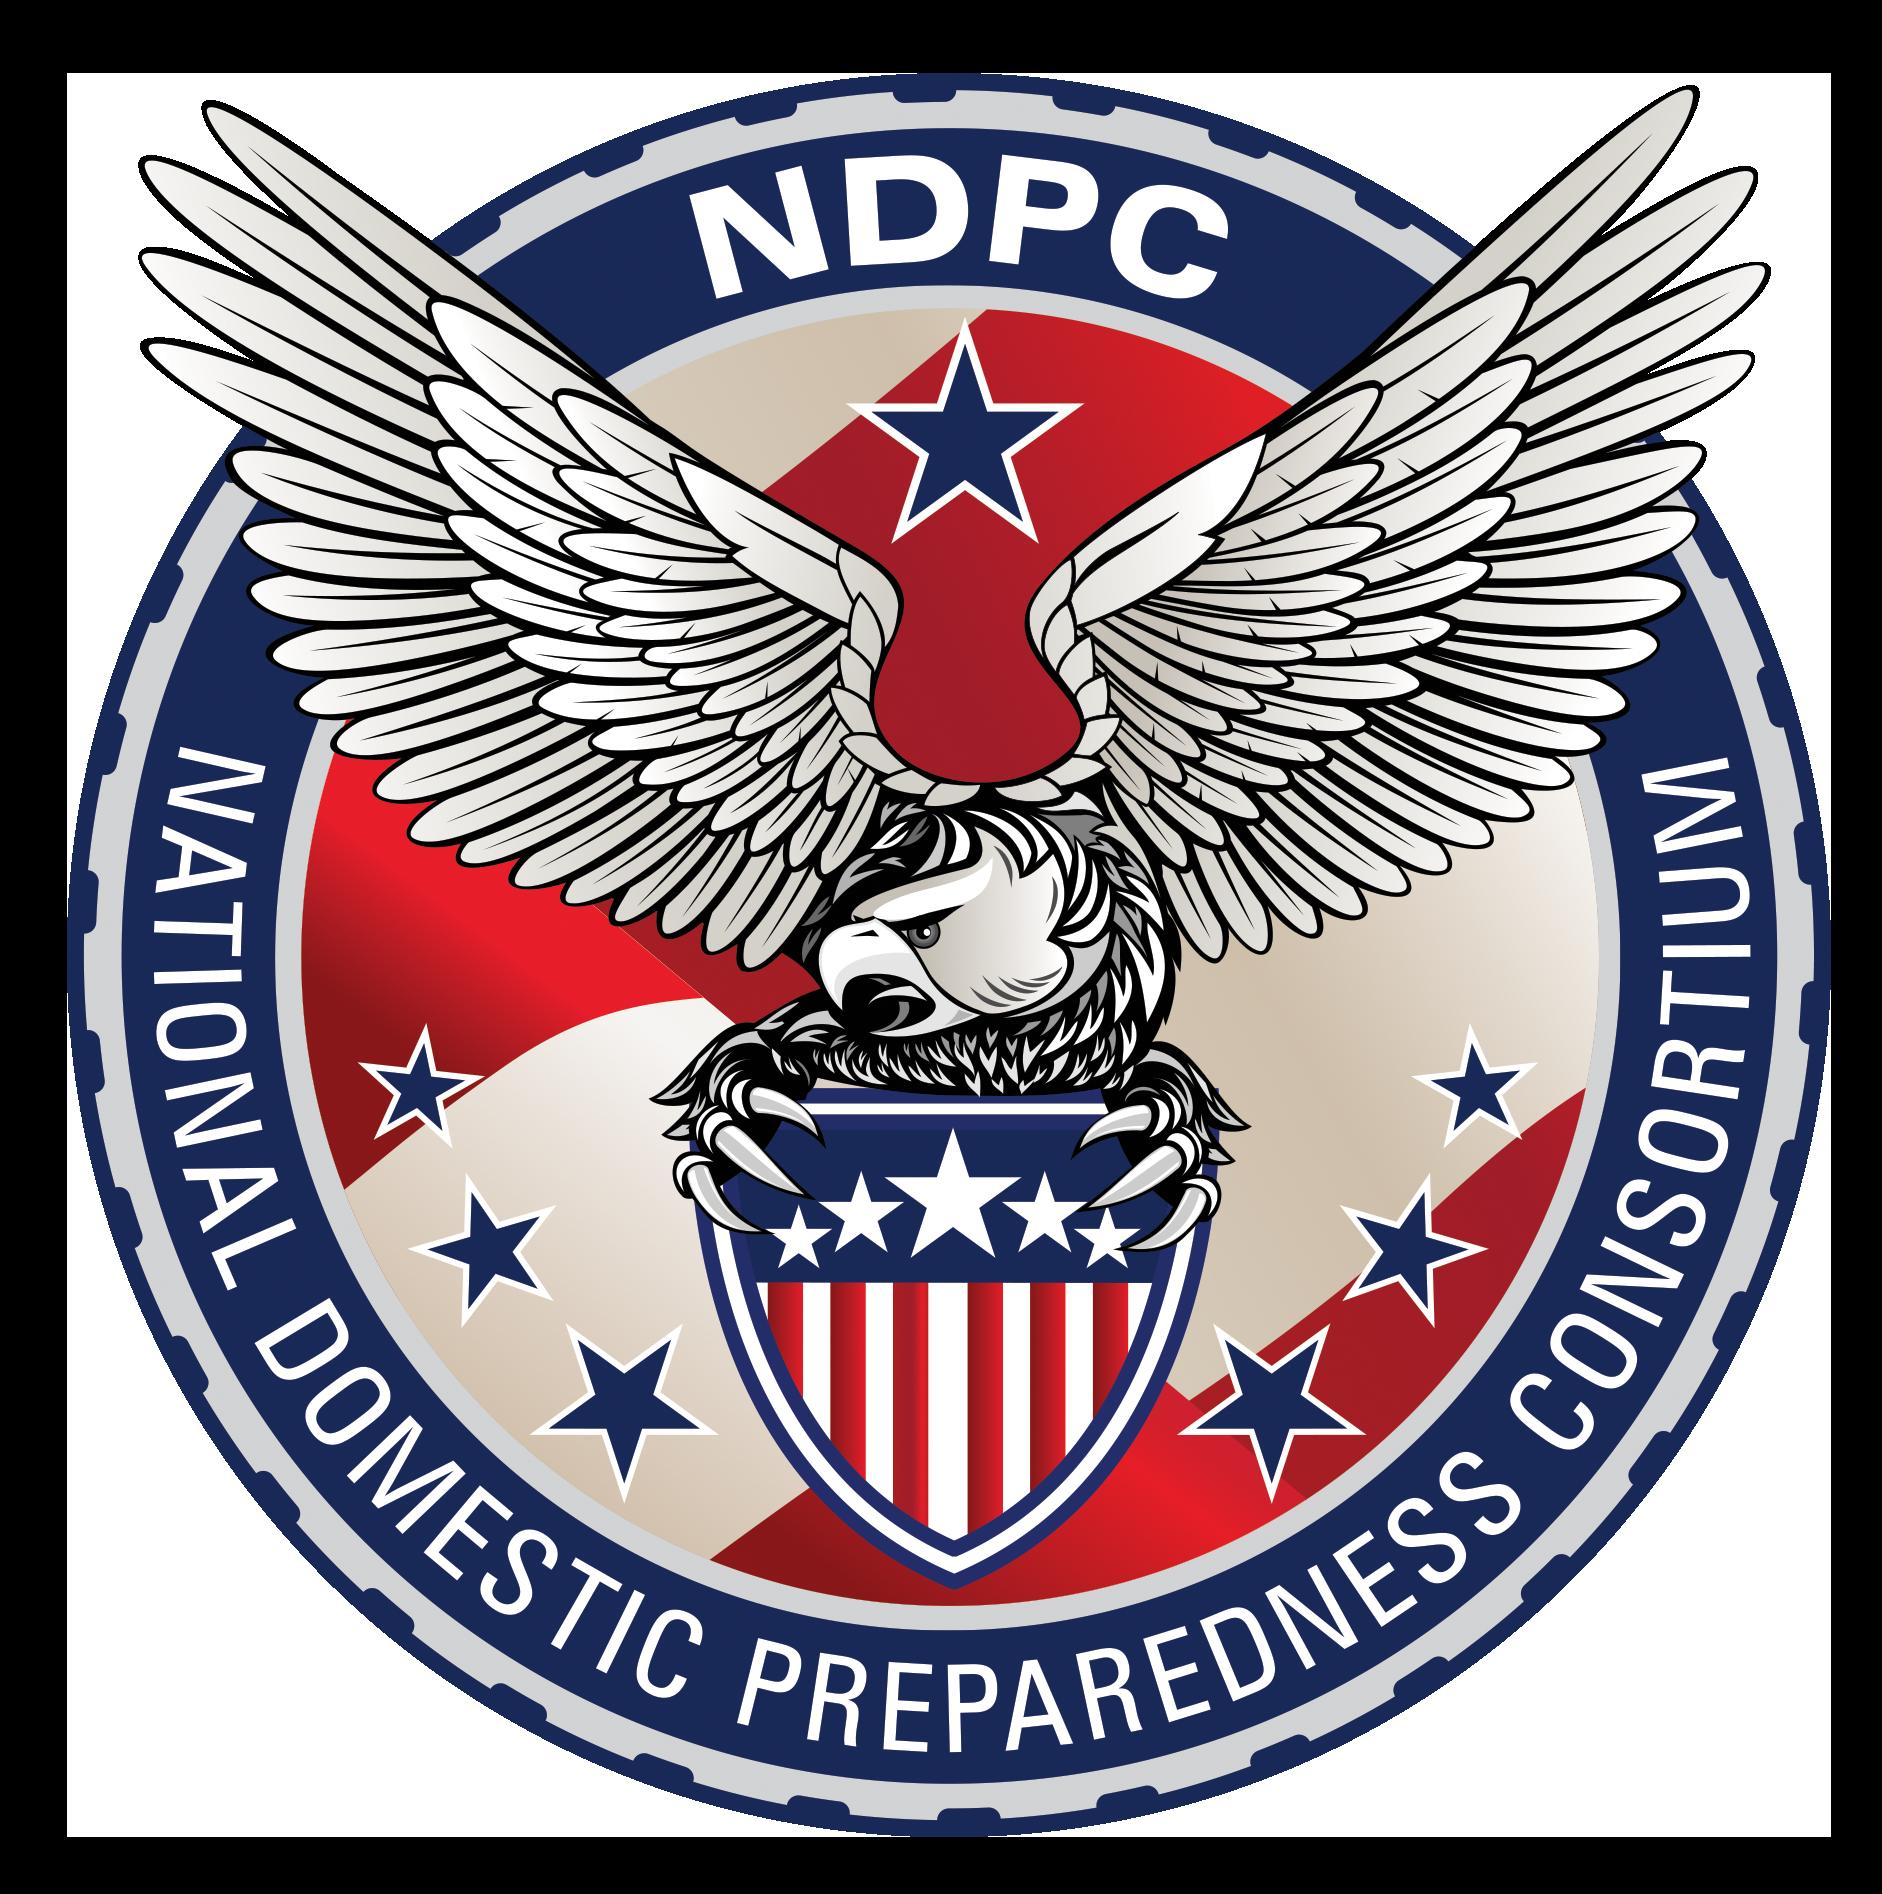 NDPC.png